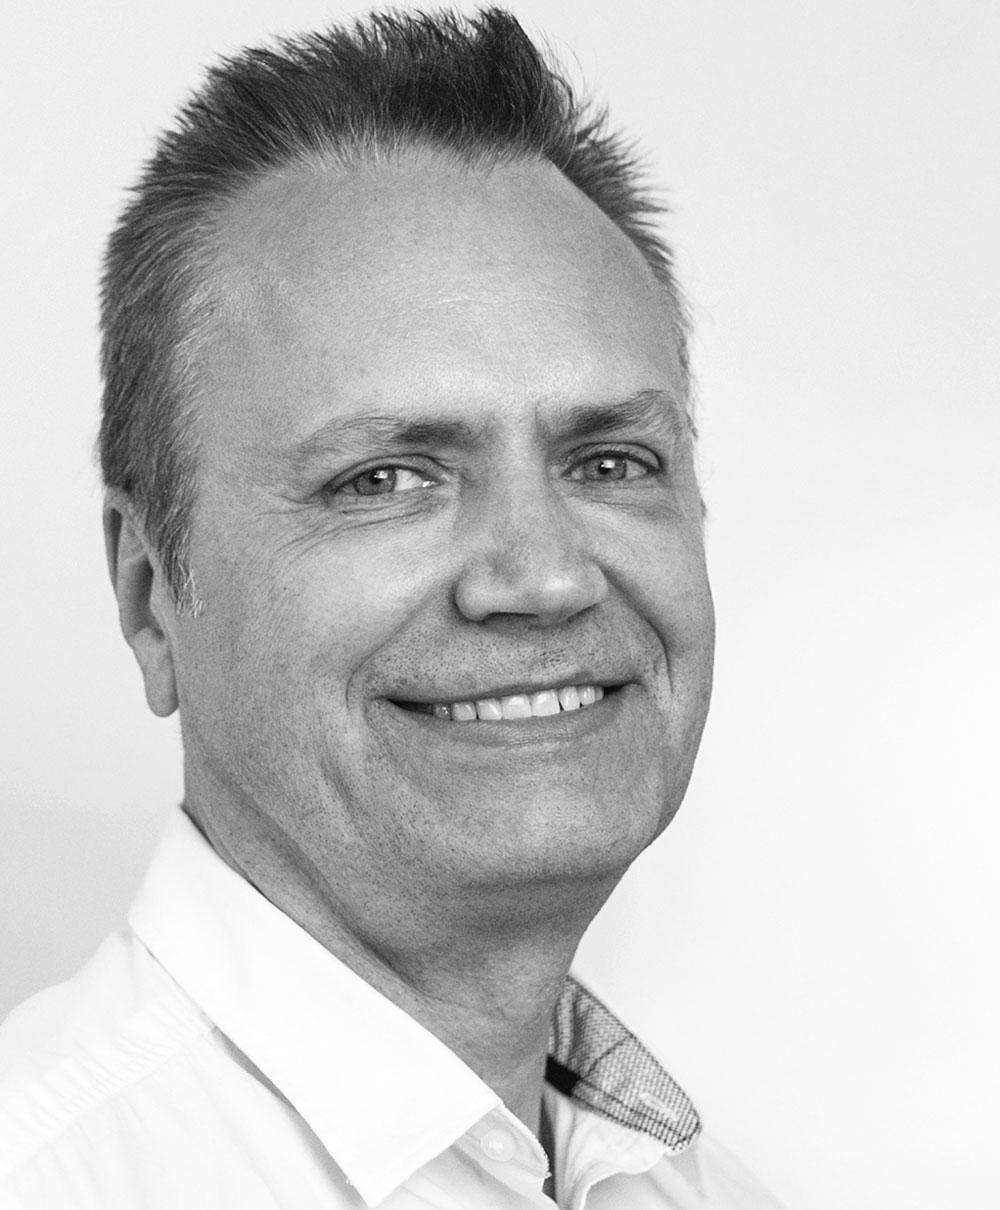 Headshot of Peter Spal